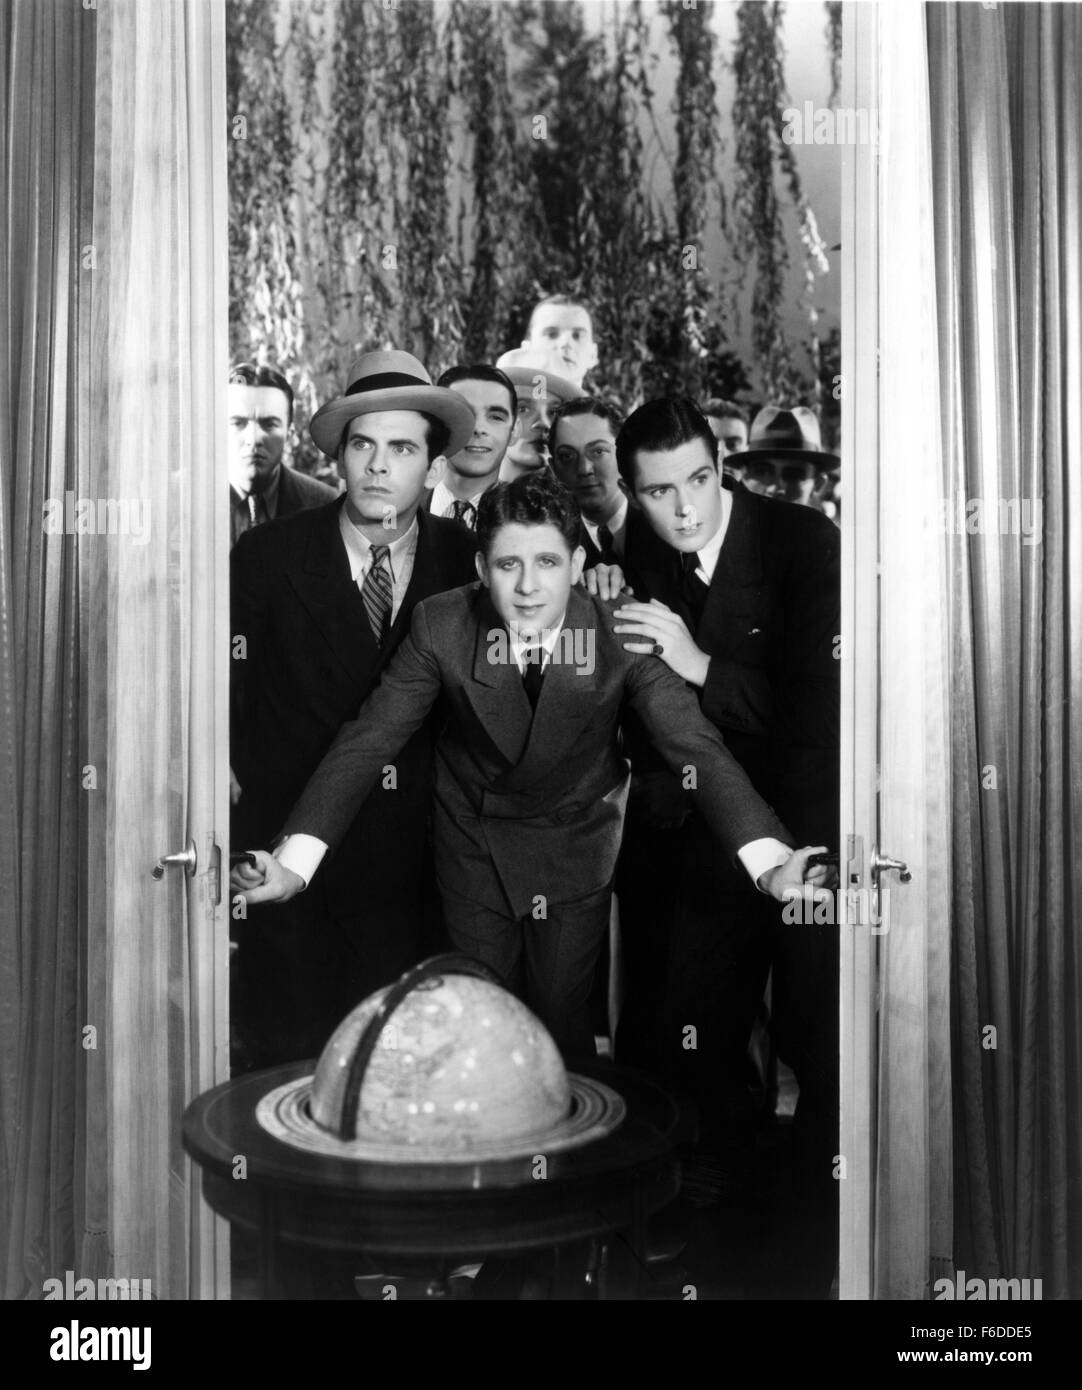 RELEASE DATE: December 1, 1929. MOVIE TITLE: The Vagabond Lover. STUDIO: RKO Radio Pictures. PLOT: College senior - Stock Image